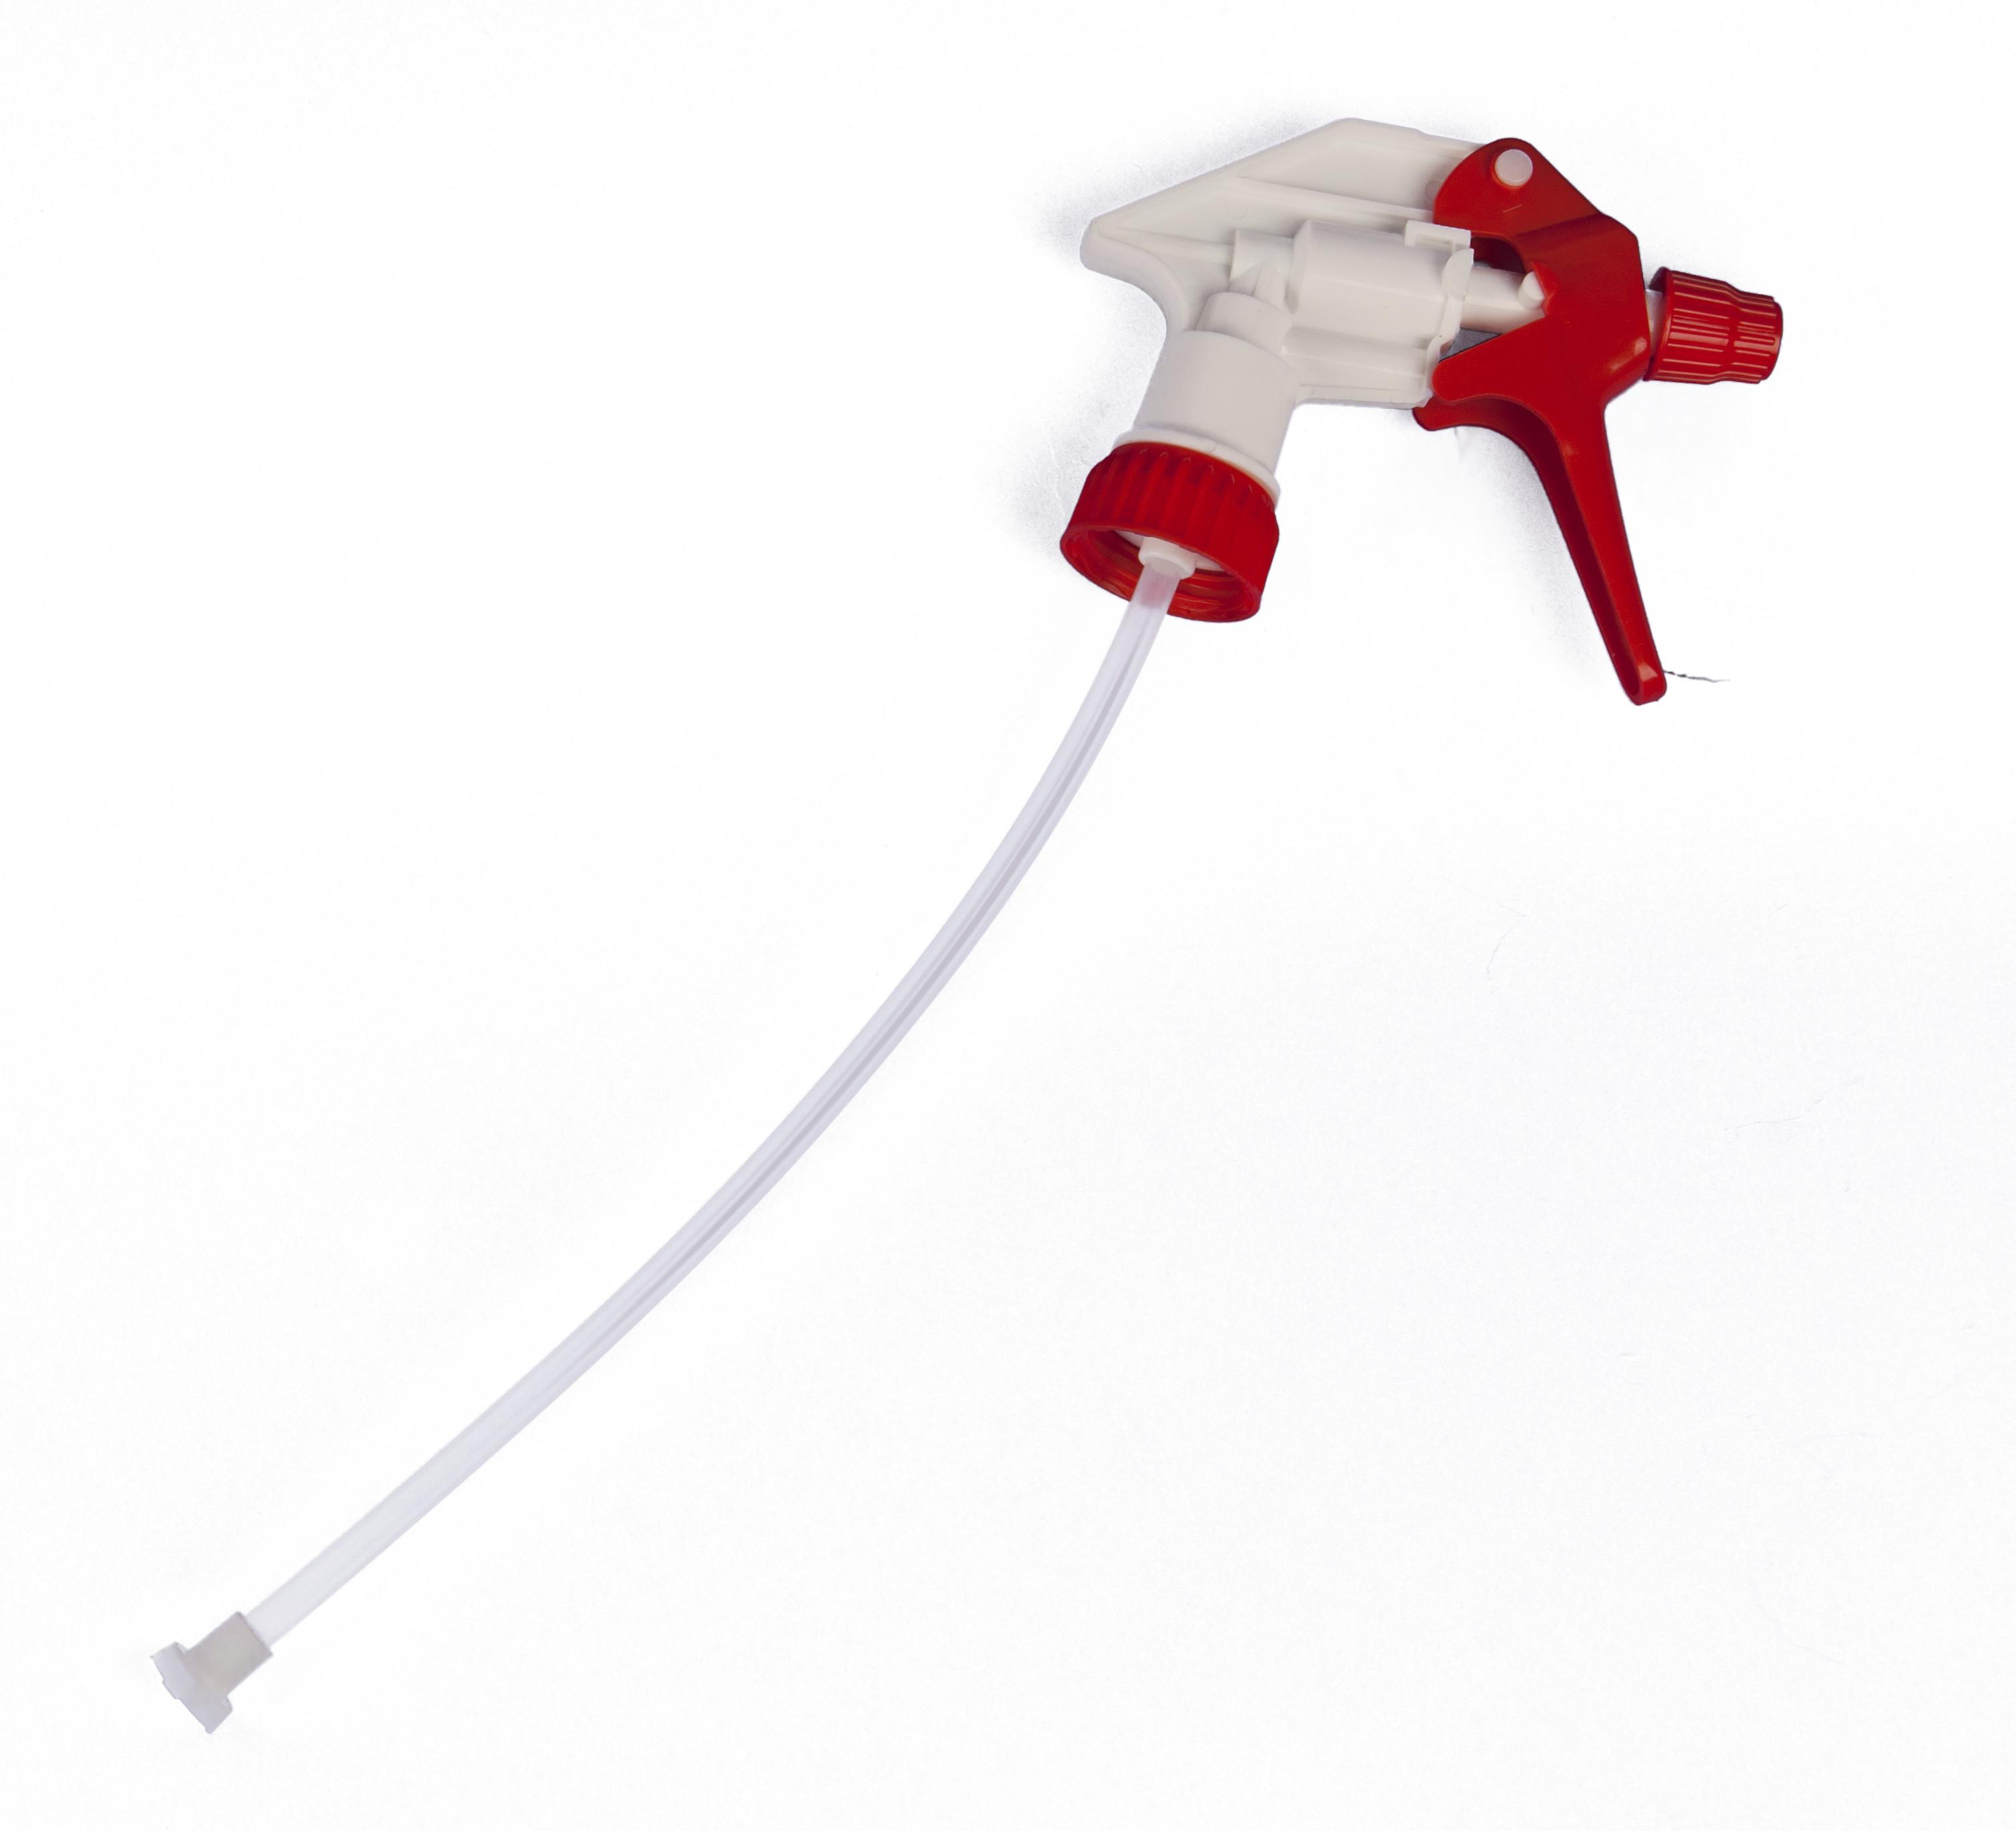 APS™ Trigger Sprayer